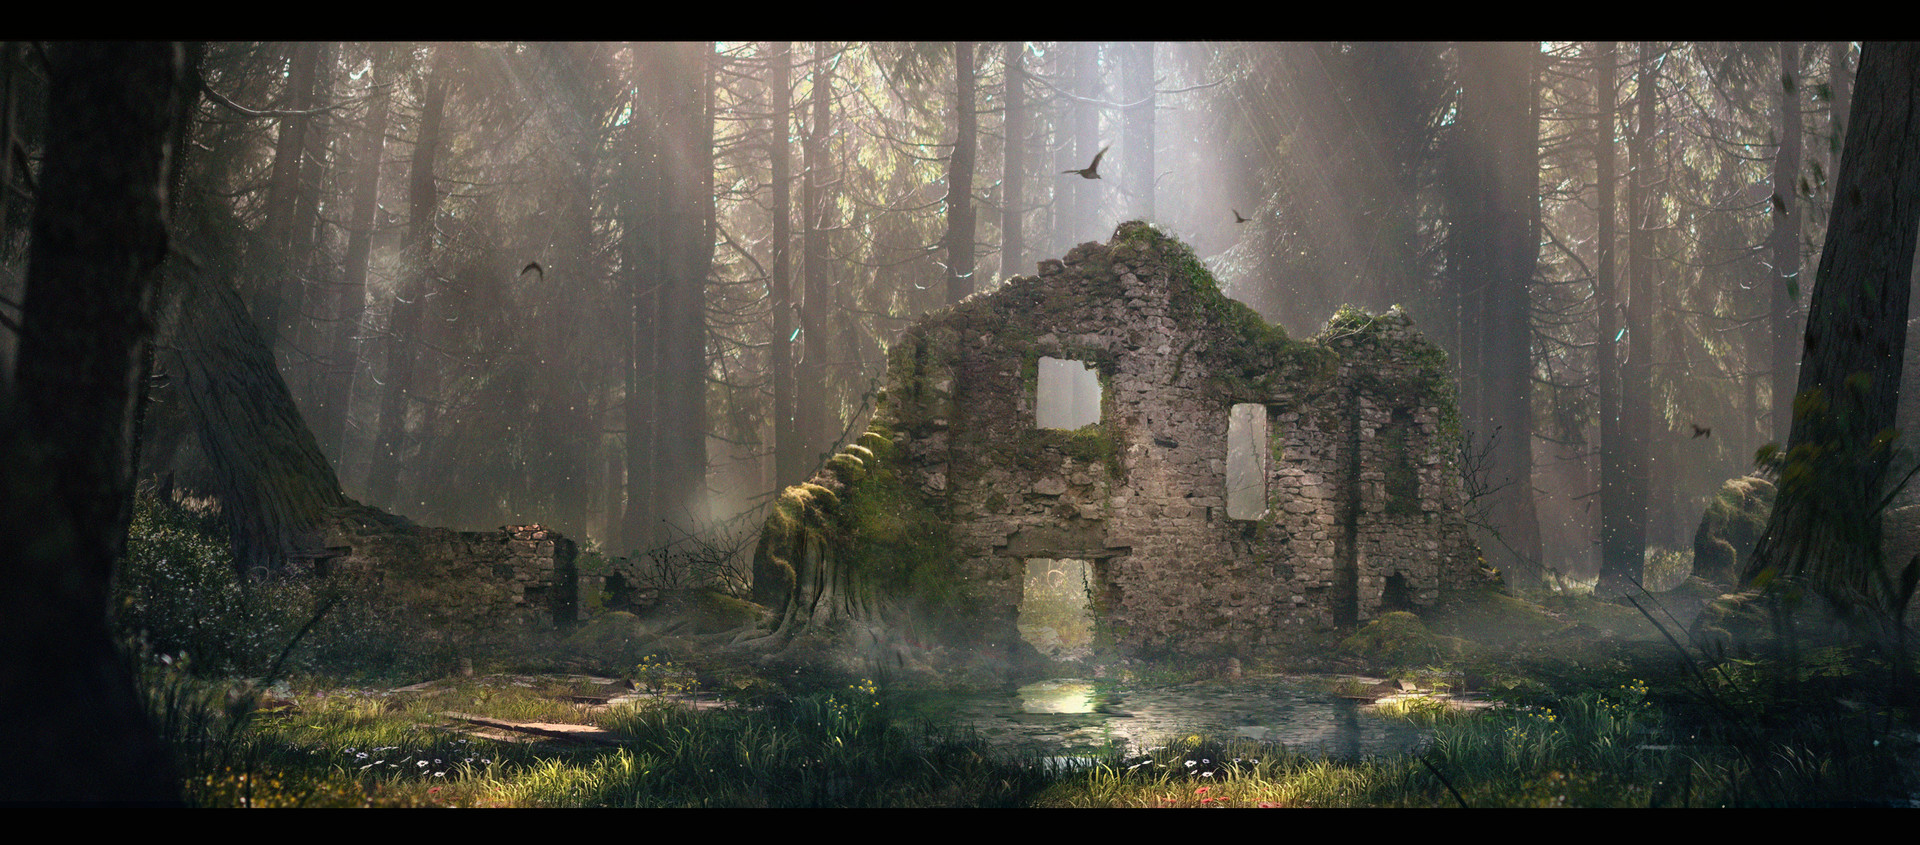 Julian calle magical forest 2web